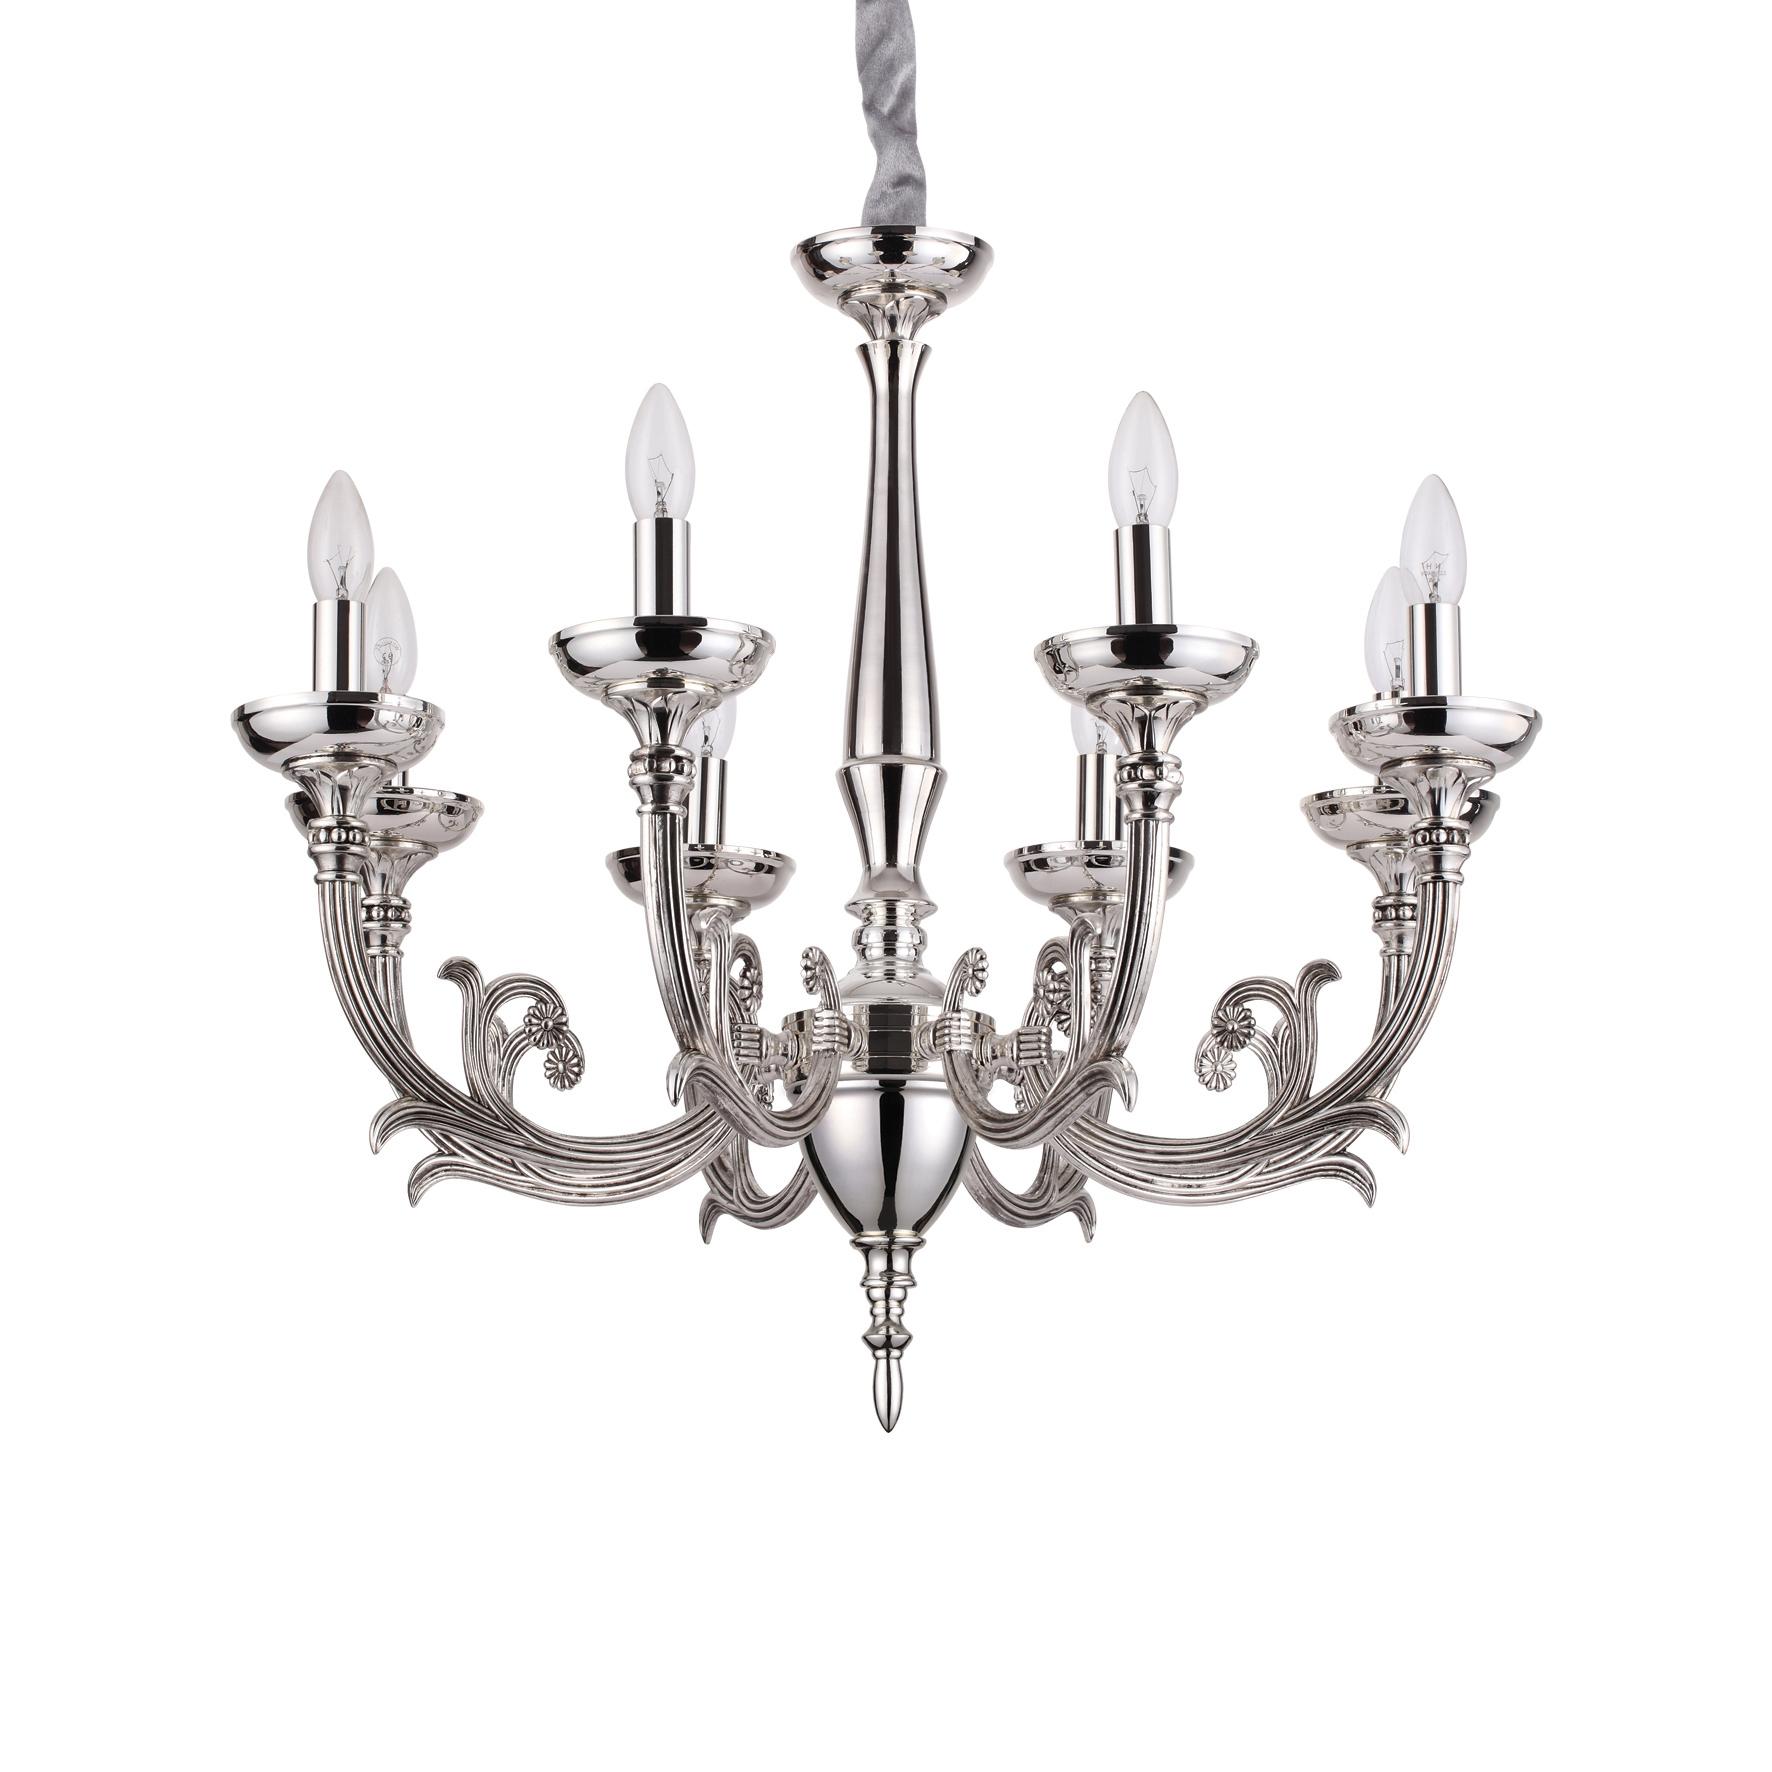 Lustra Lancelot SP8 Silver